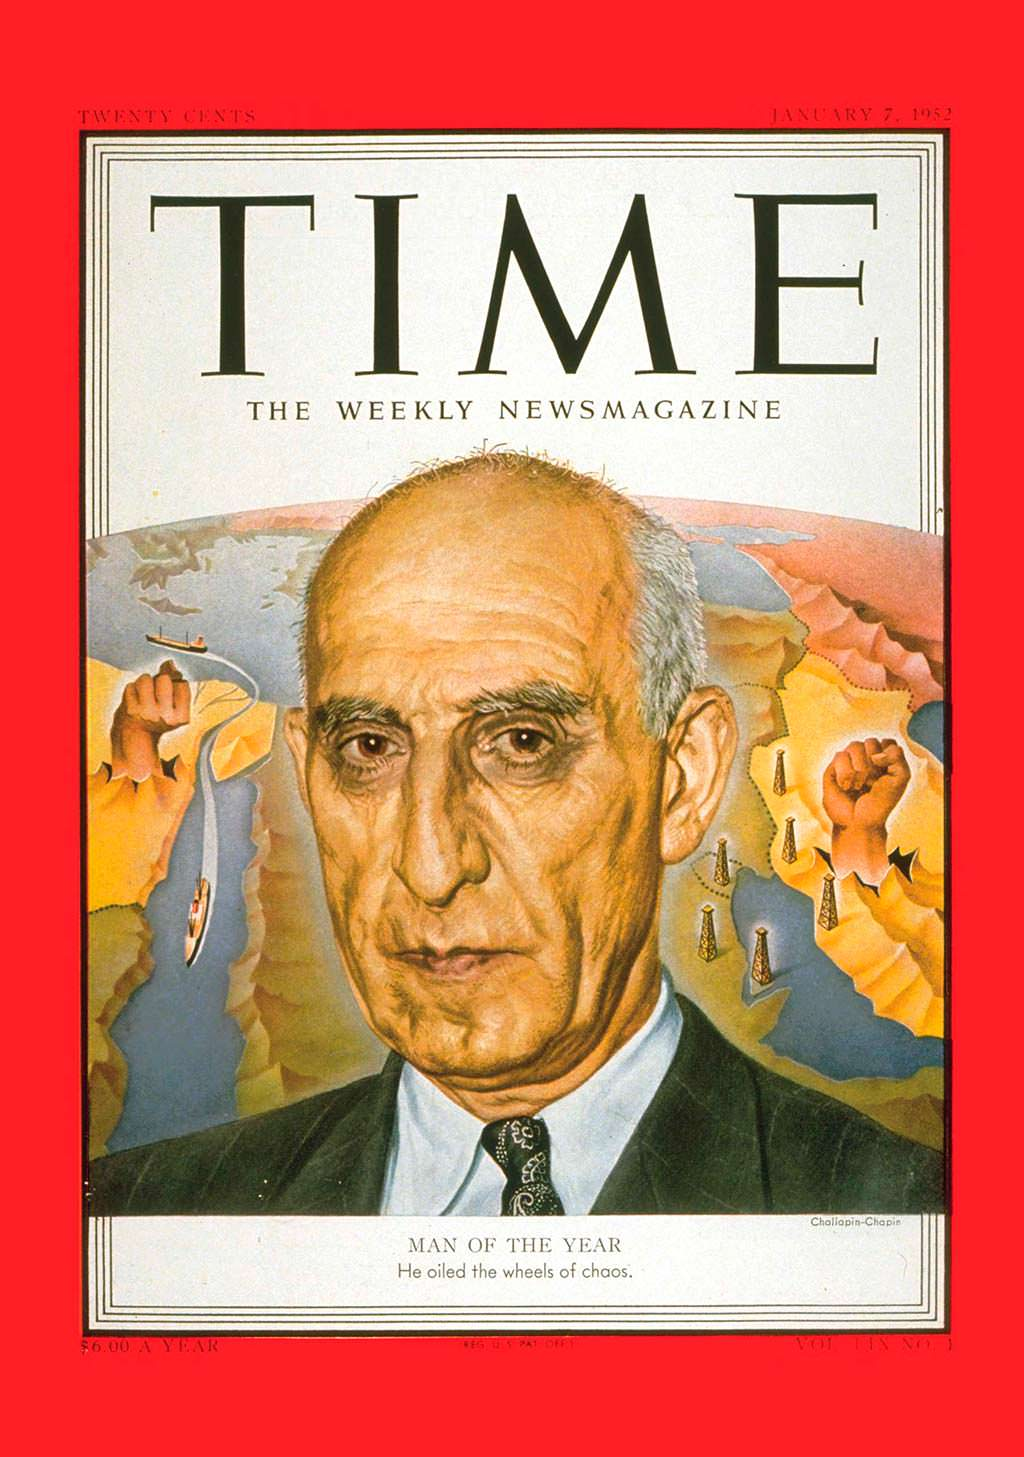 1951 год. Премьер Ирана Мохаммед Мосаддык на обложке Time